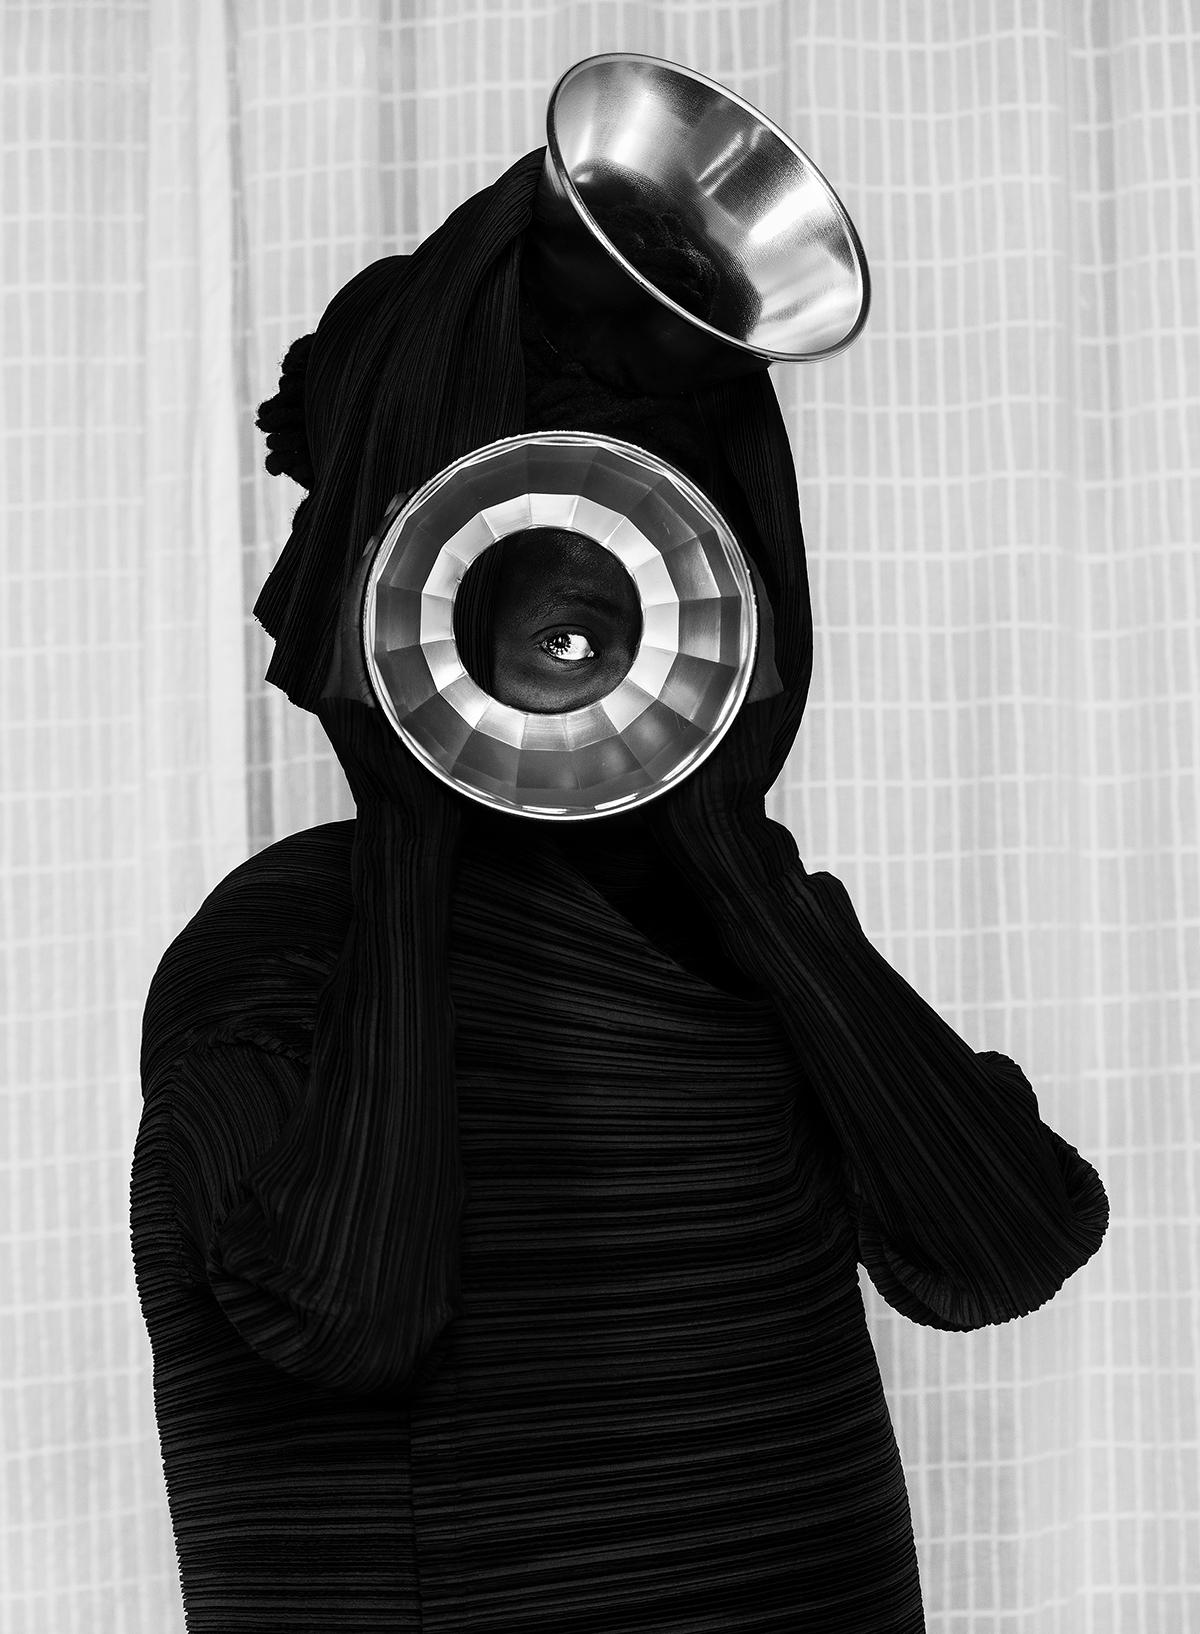 Zanele Muholi - Bester VIII, Philadelphia, 2018, 2018